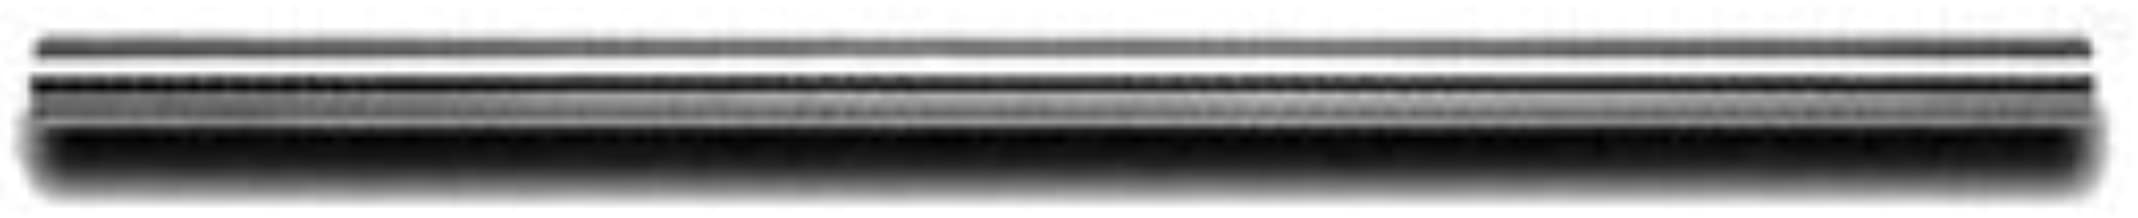 10 Pcs. .0292 Size: #69 Drill Blank OAL 1-3//8